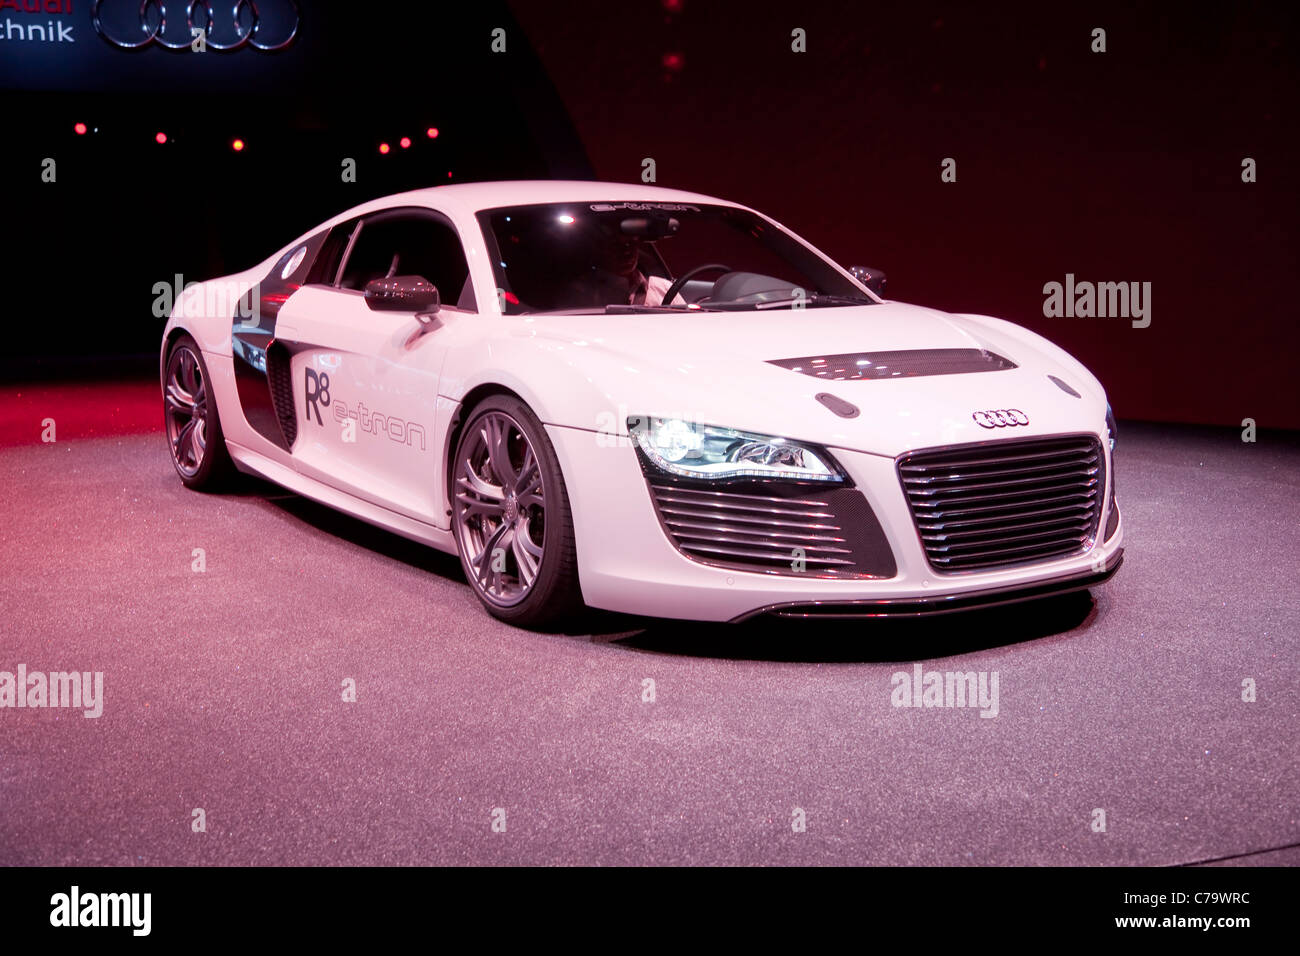 Audi R8 e-tron on the IAA 2011 International Motor Show in Frankfurt am Main, Germany - Stock Image